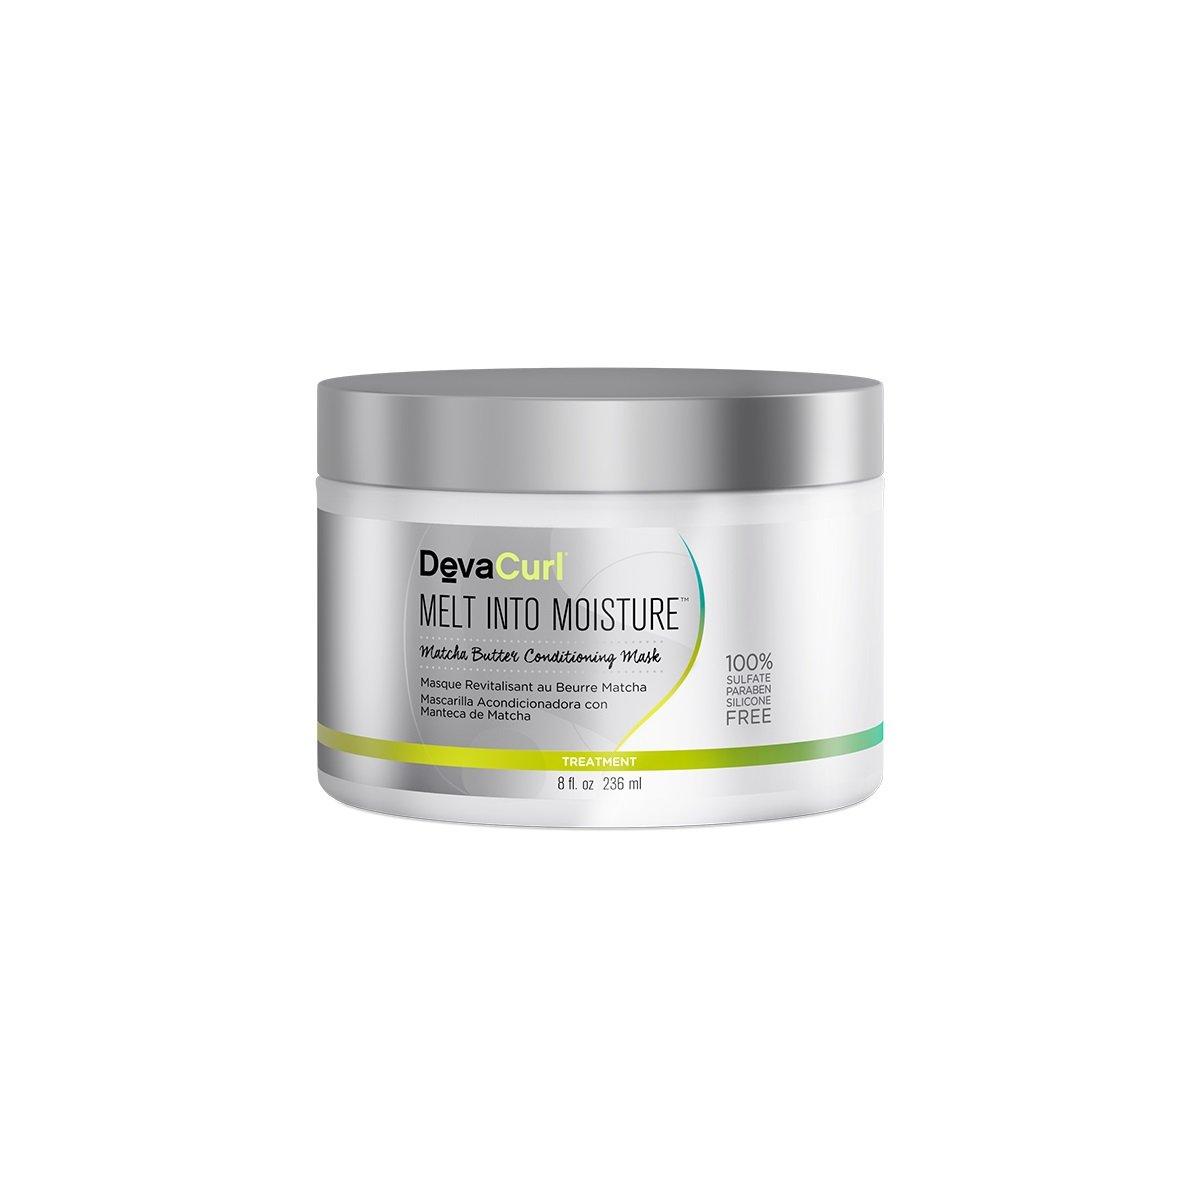 DevaCurl Melt Into Moisture Mask 8oz by DevaCurl